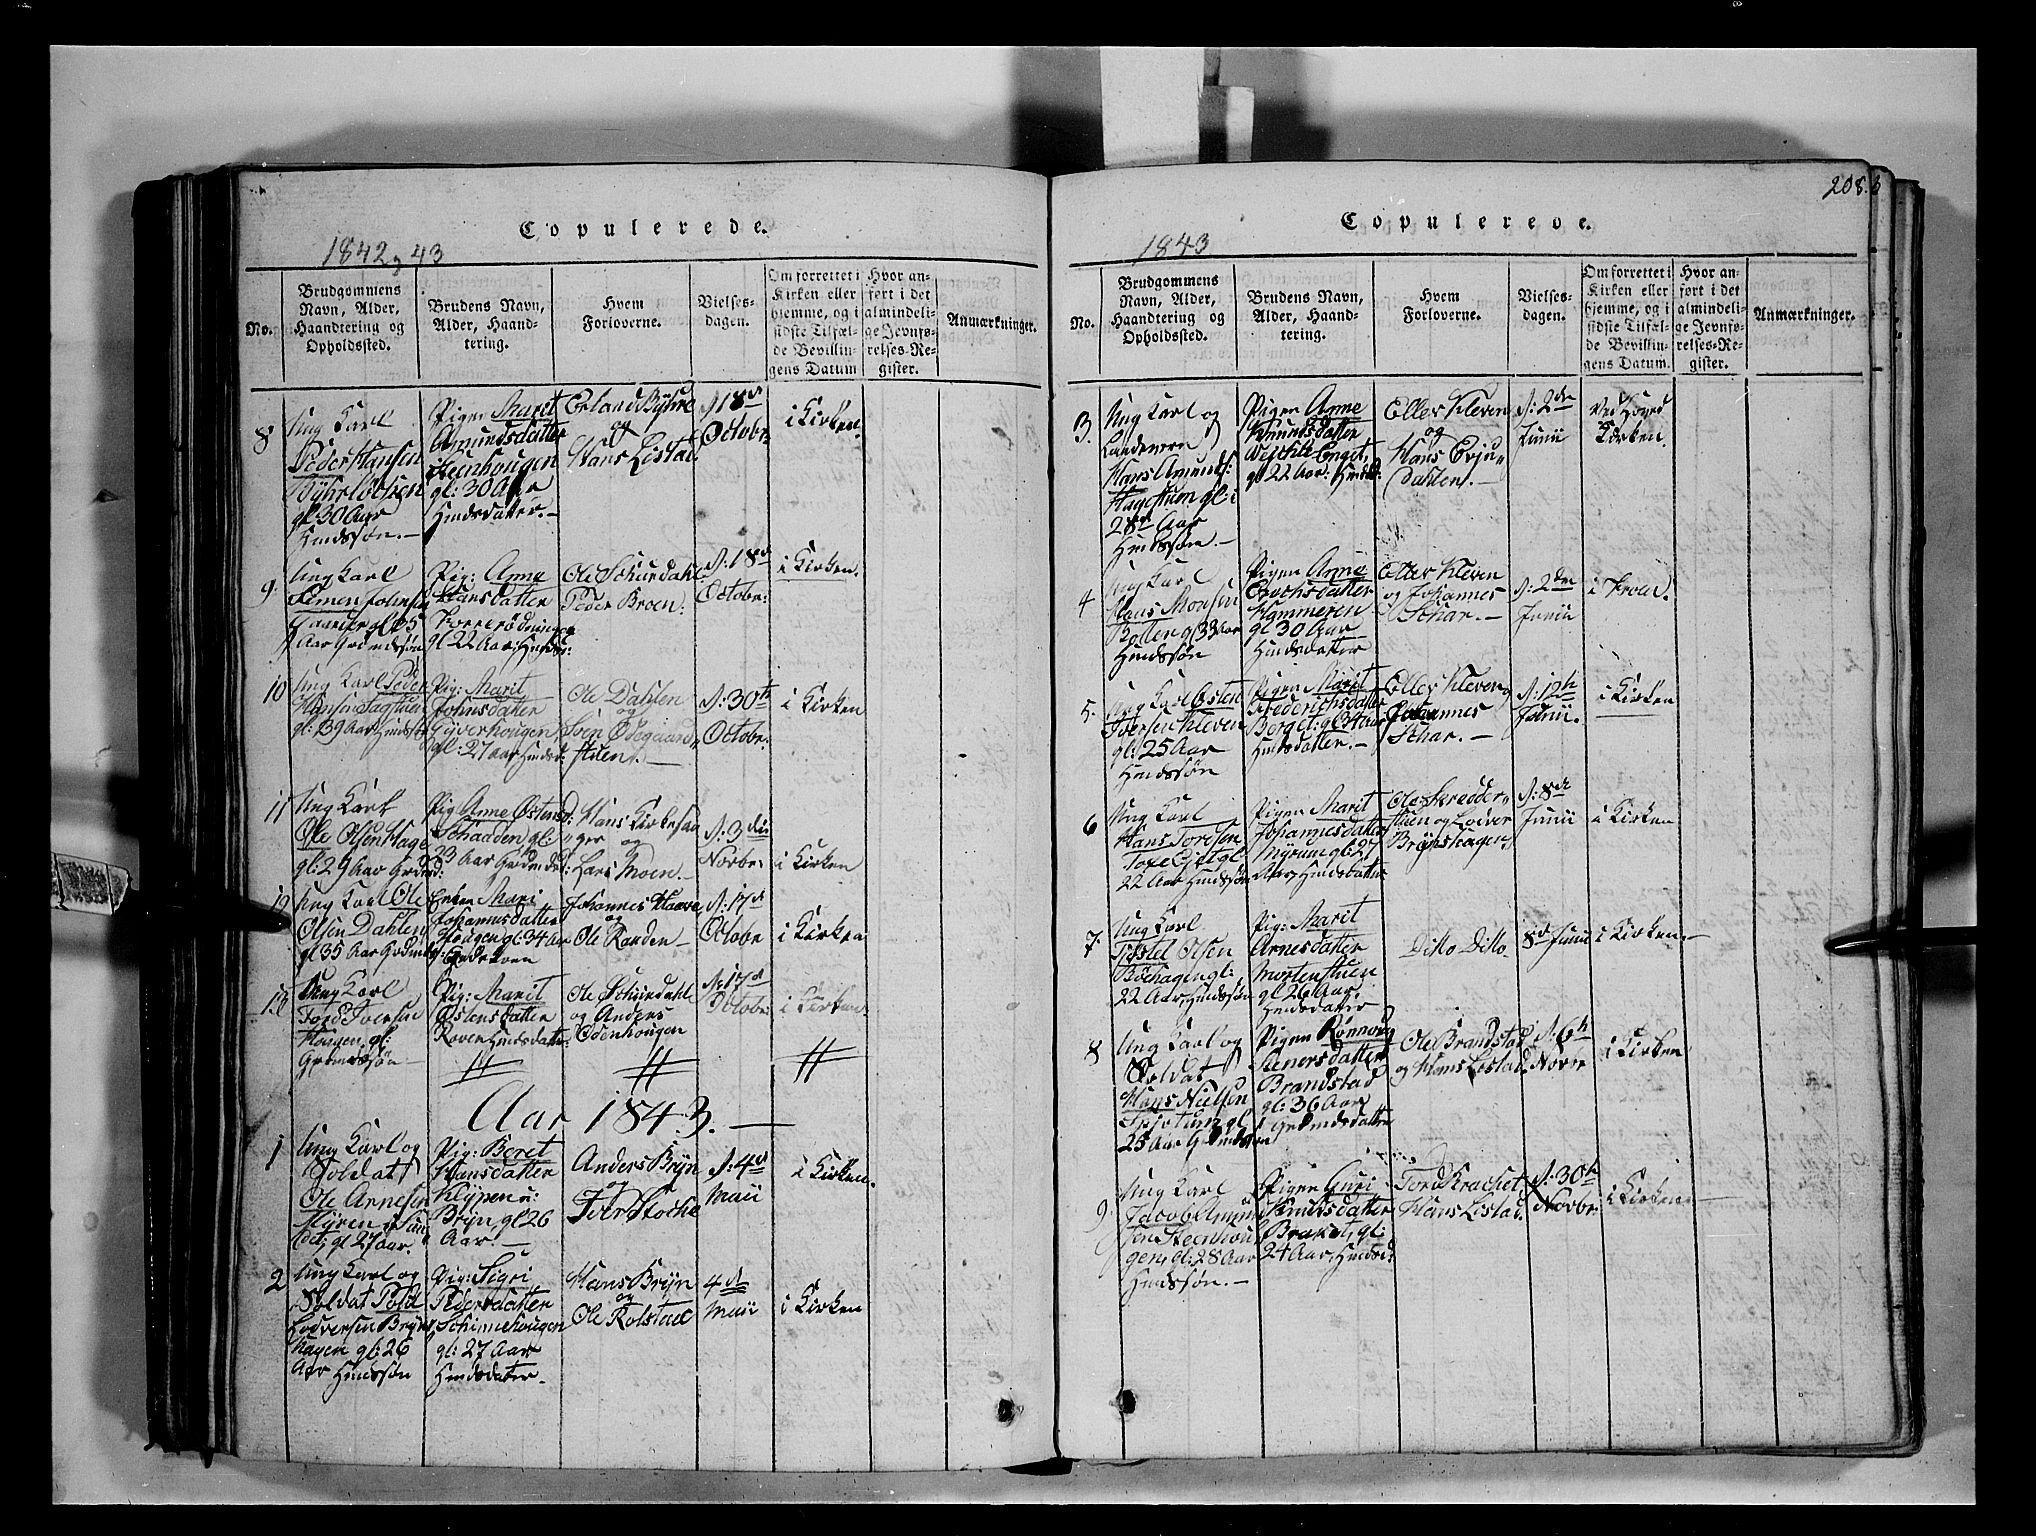 SAH, Fron prestekontor, H/Ha/Hab/L0004: Klokkerbok nr. 4, 1816-1850, s. 208